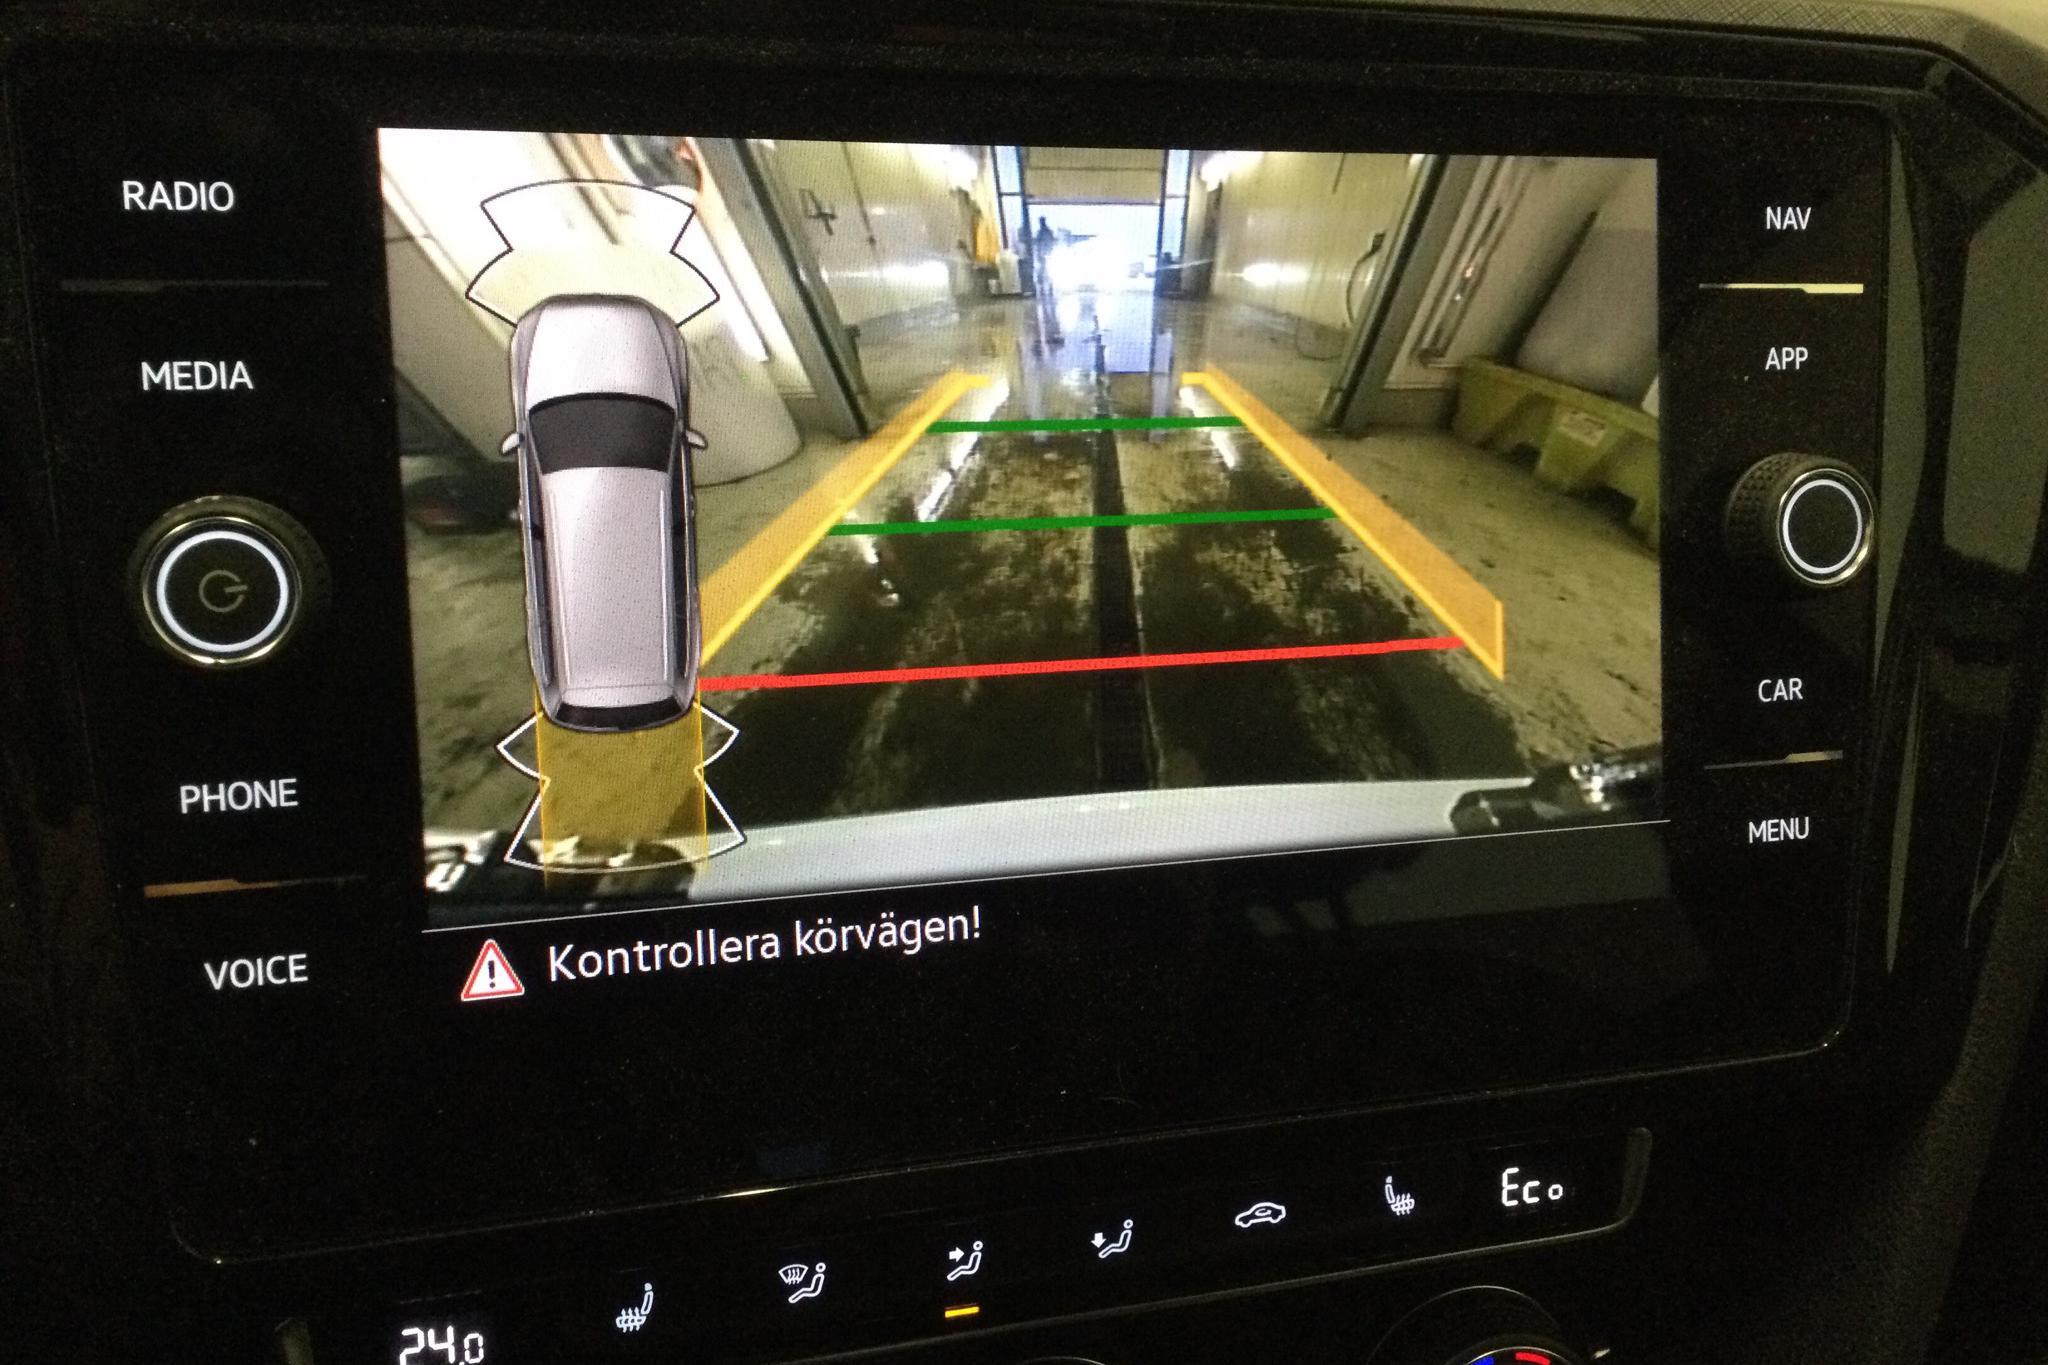 VW Passat 1.4 Plug-in-Hybrid Sportscombi (218hk) - 2 518 mil - Automat - vit - 2020